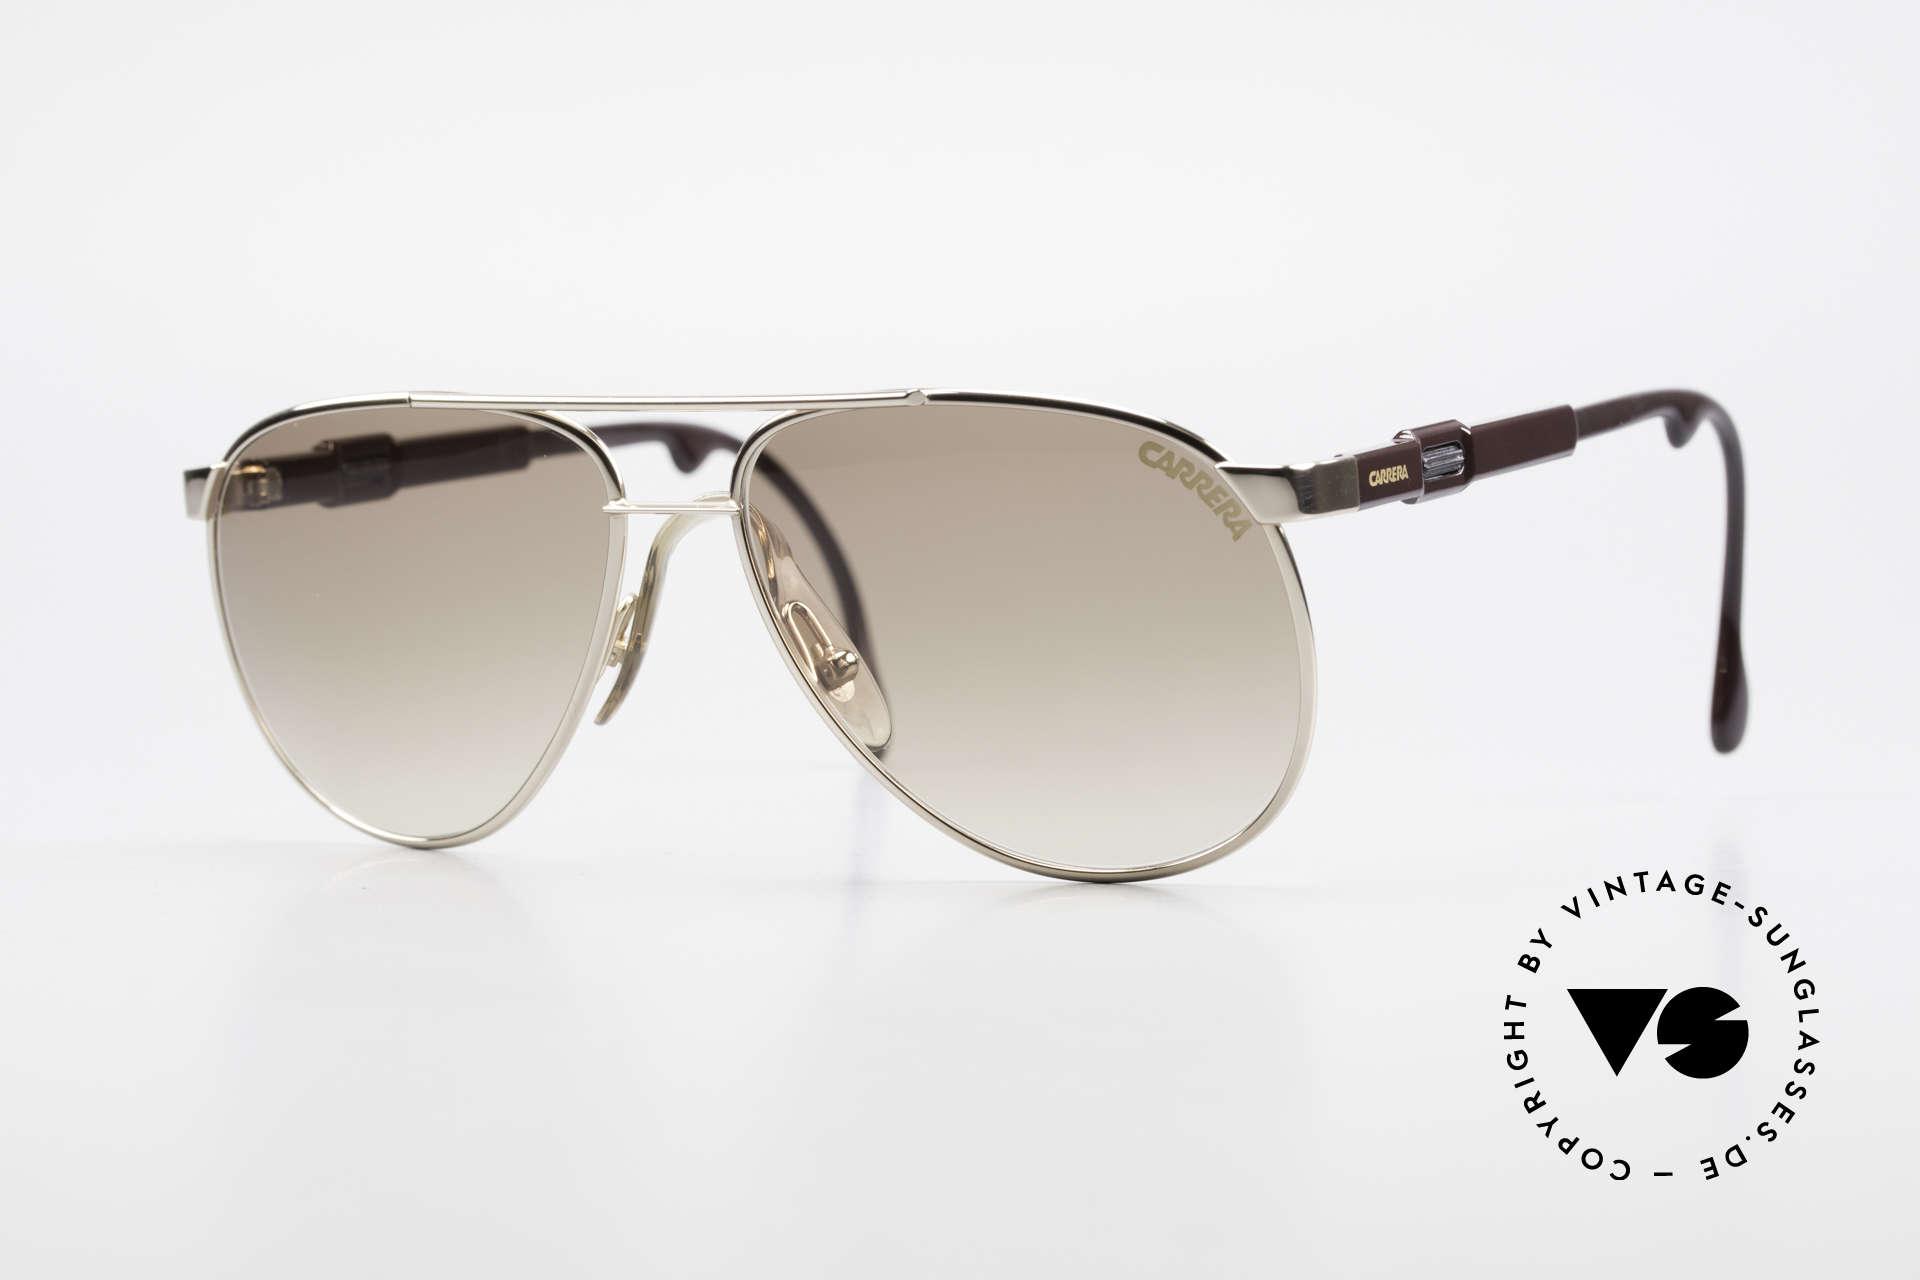 Carrera 5348 80's Vario Sports Sunglasses, brilliant vintage Carrera 80s sunglasses, size 56°15, Made for Men and Women